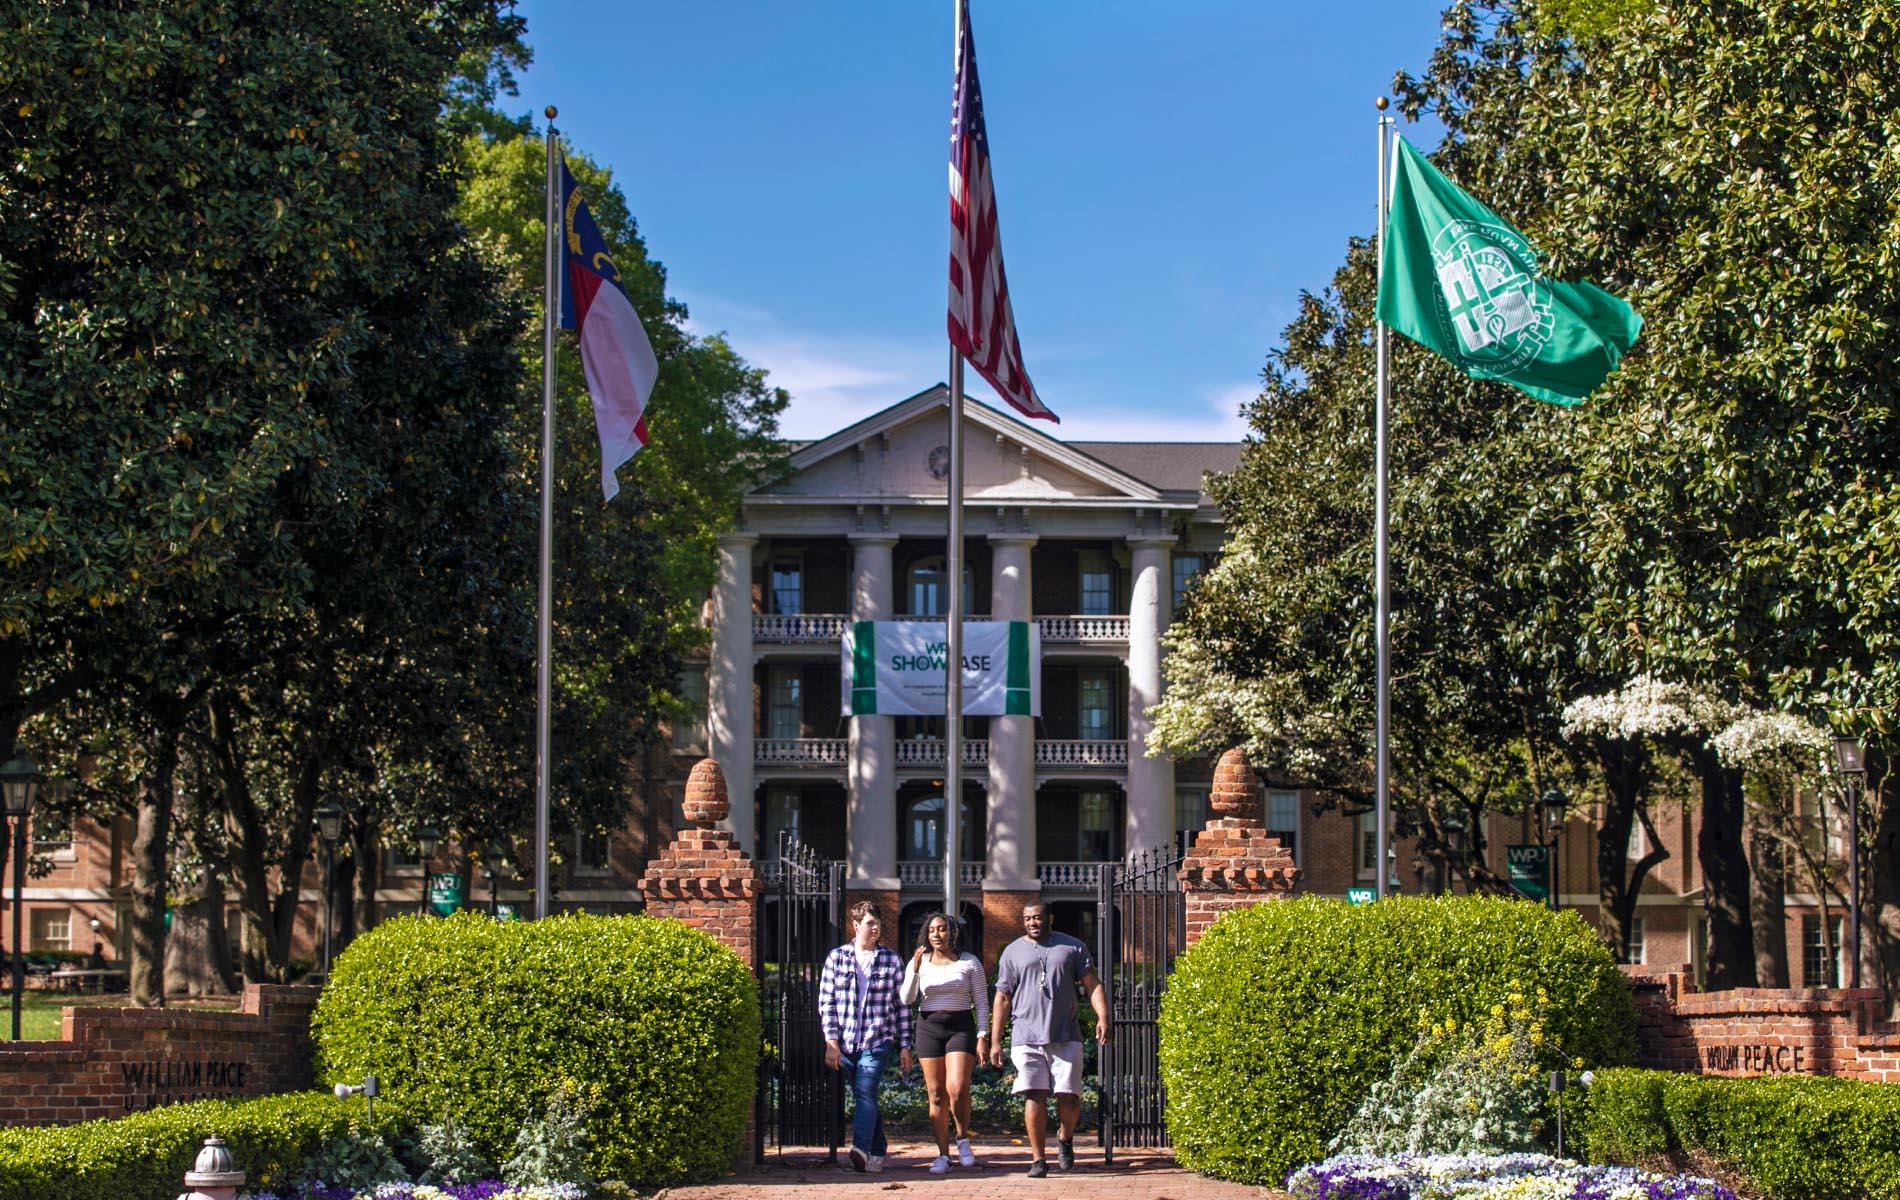 Students walk through the main gates at WPU.